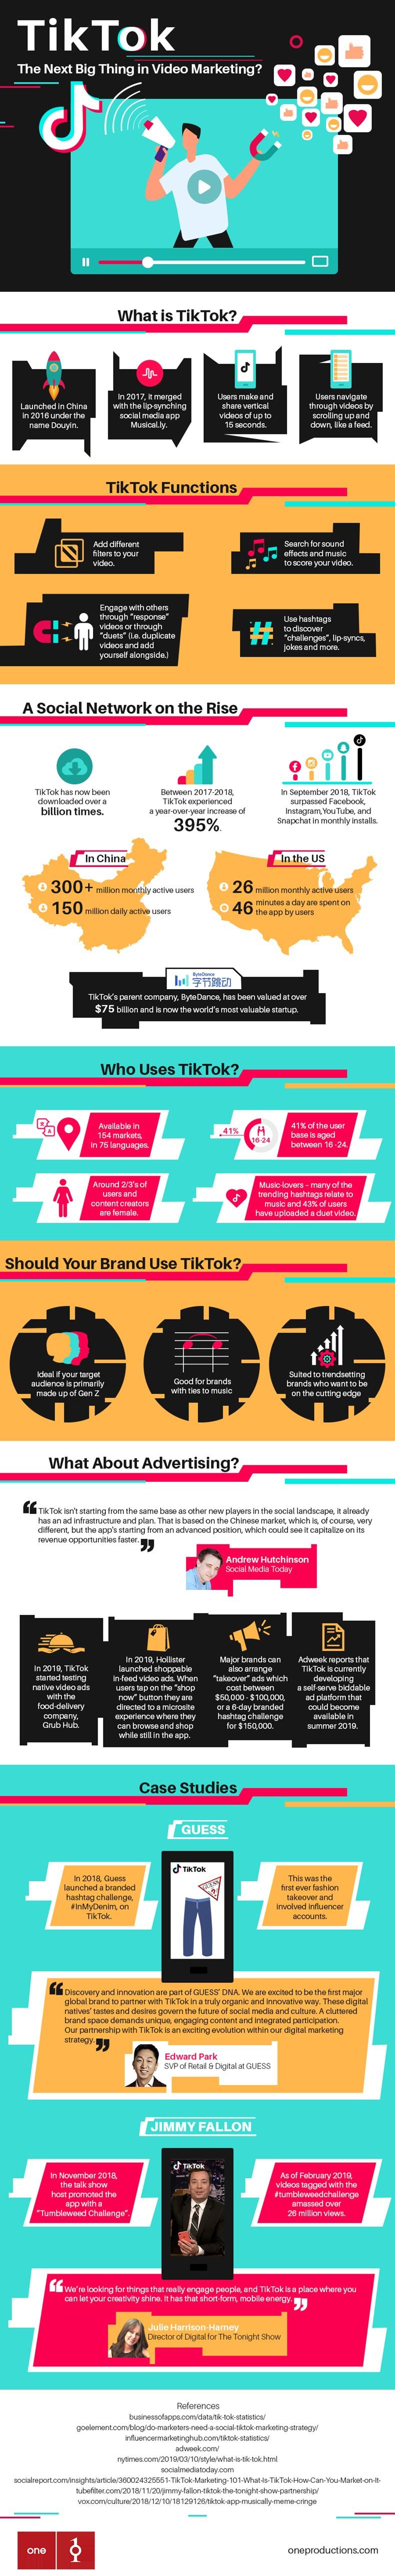 TikTok Video Marketing, The Next Big Thing [Infographic]